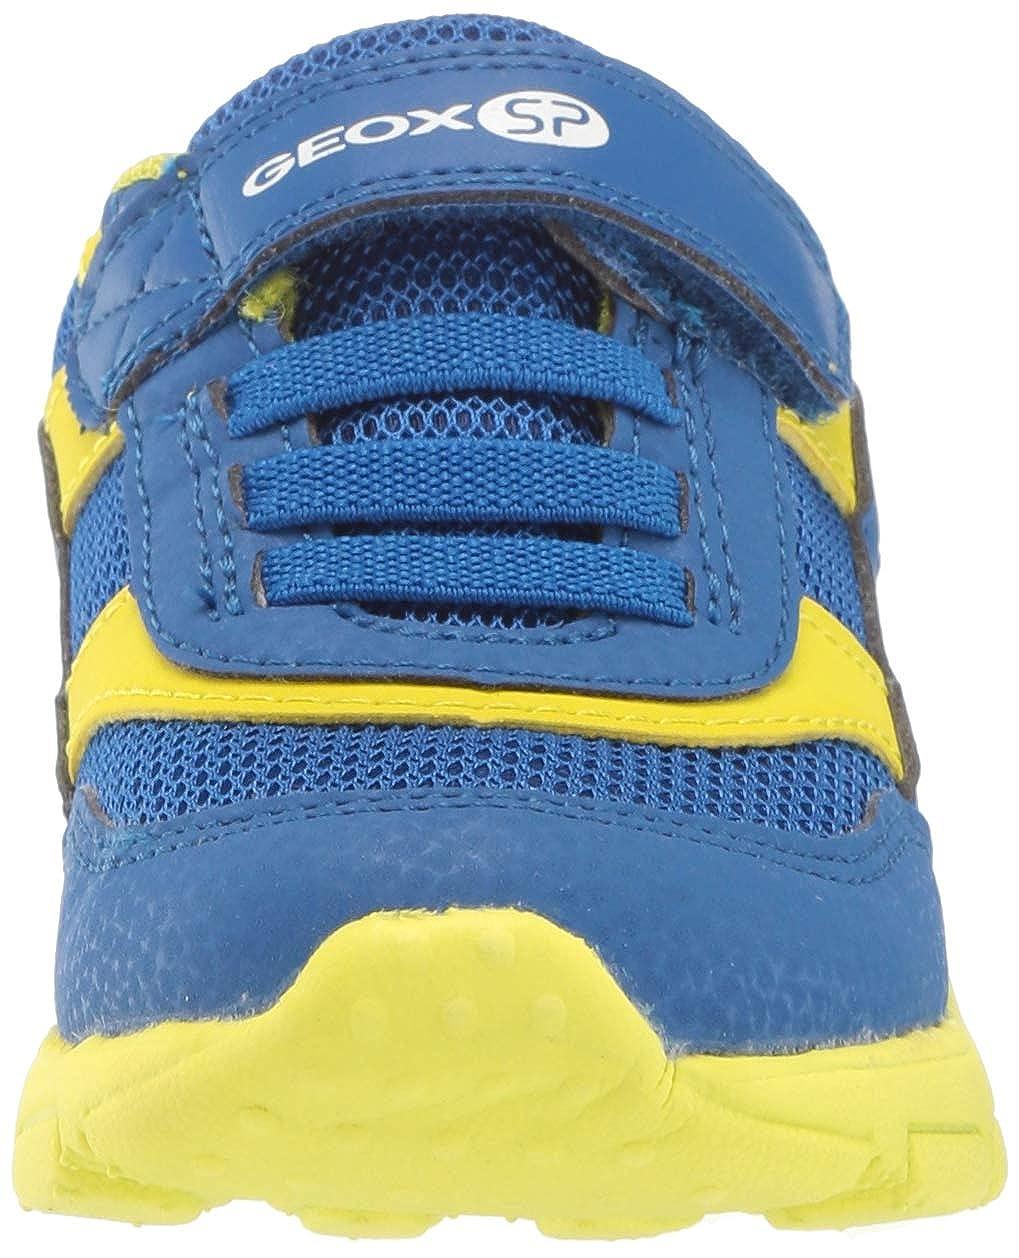 Geox Kids New Torque Boy 2 Sp Velcro Sneaker